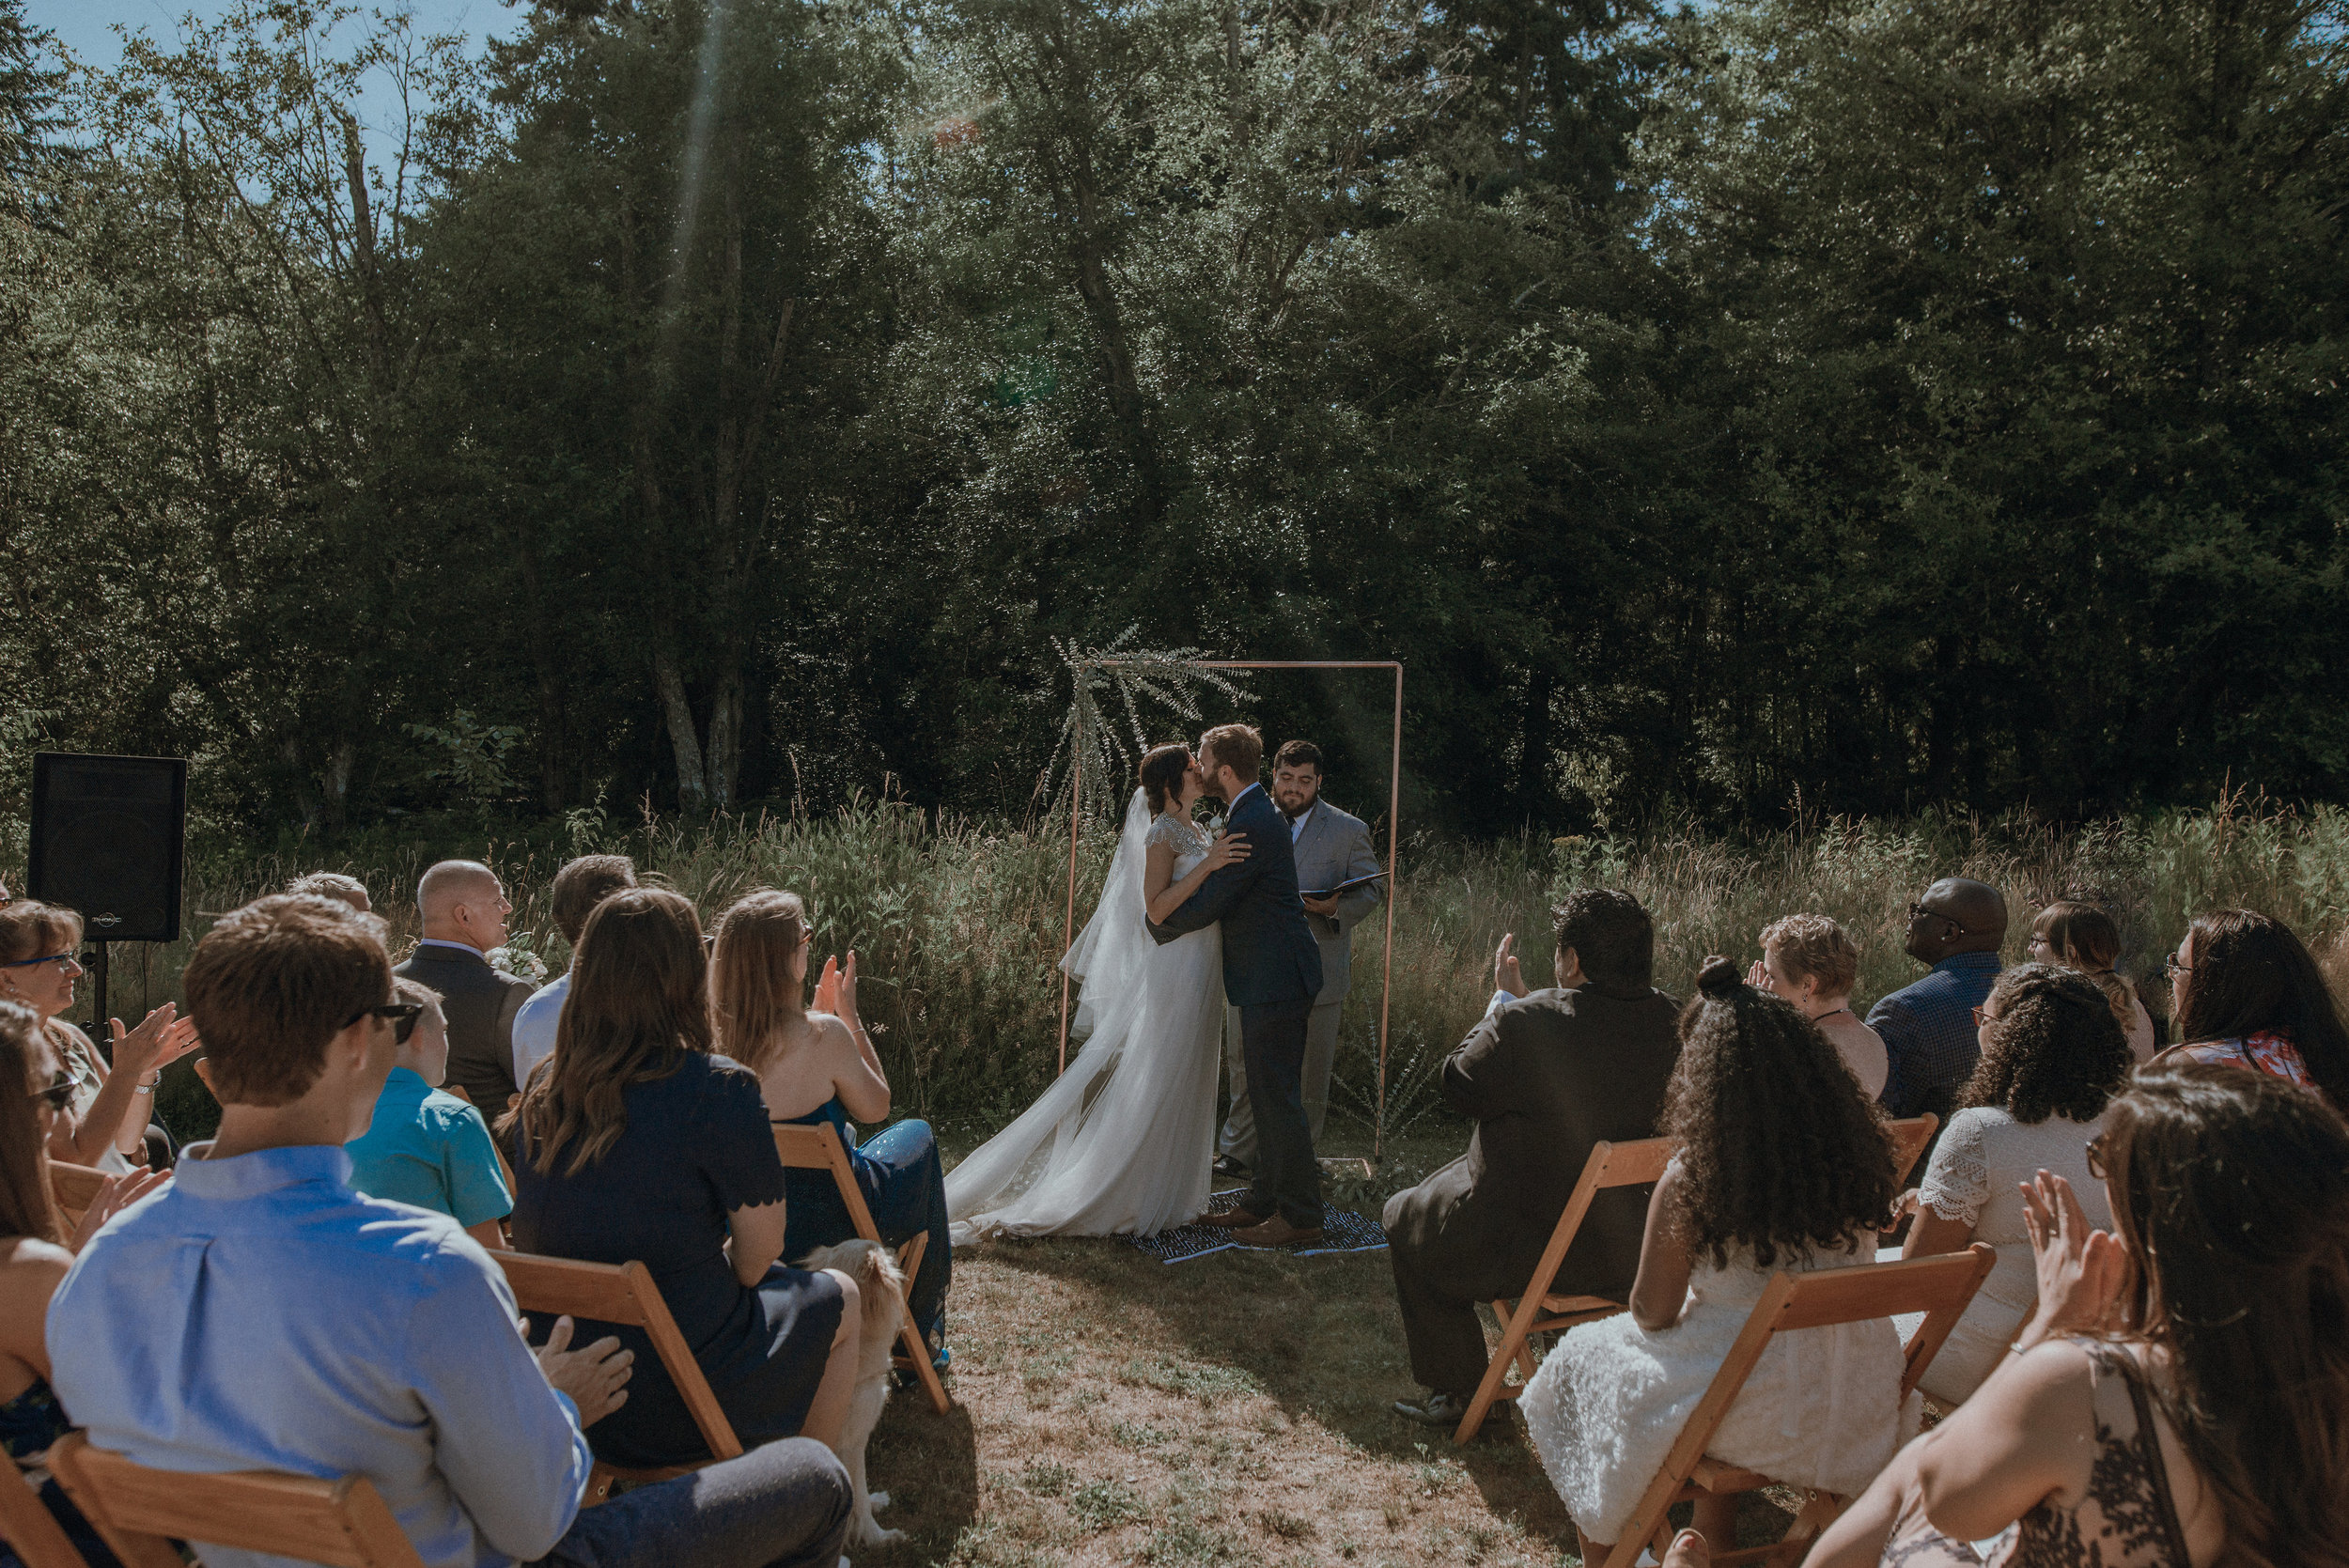 Lodges-at-Vashon-wedding68.jpg